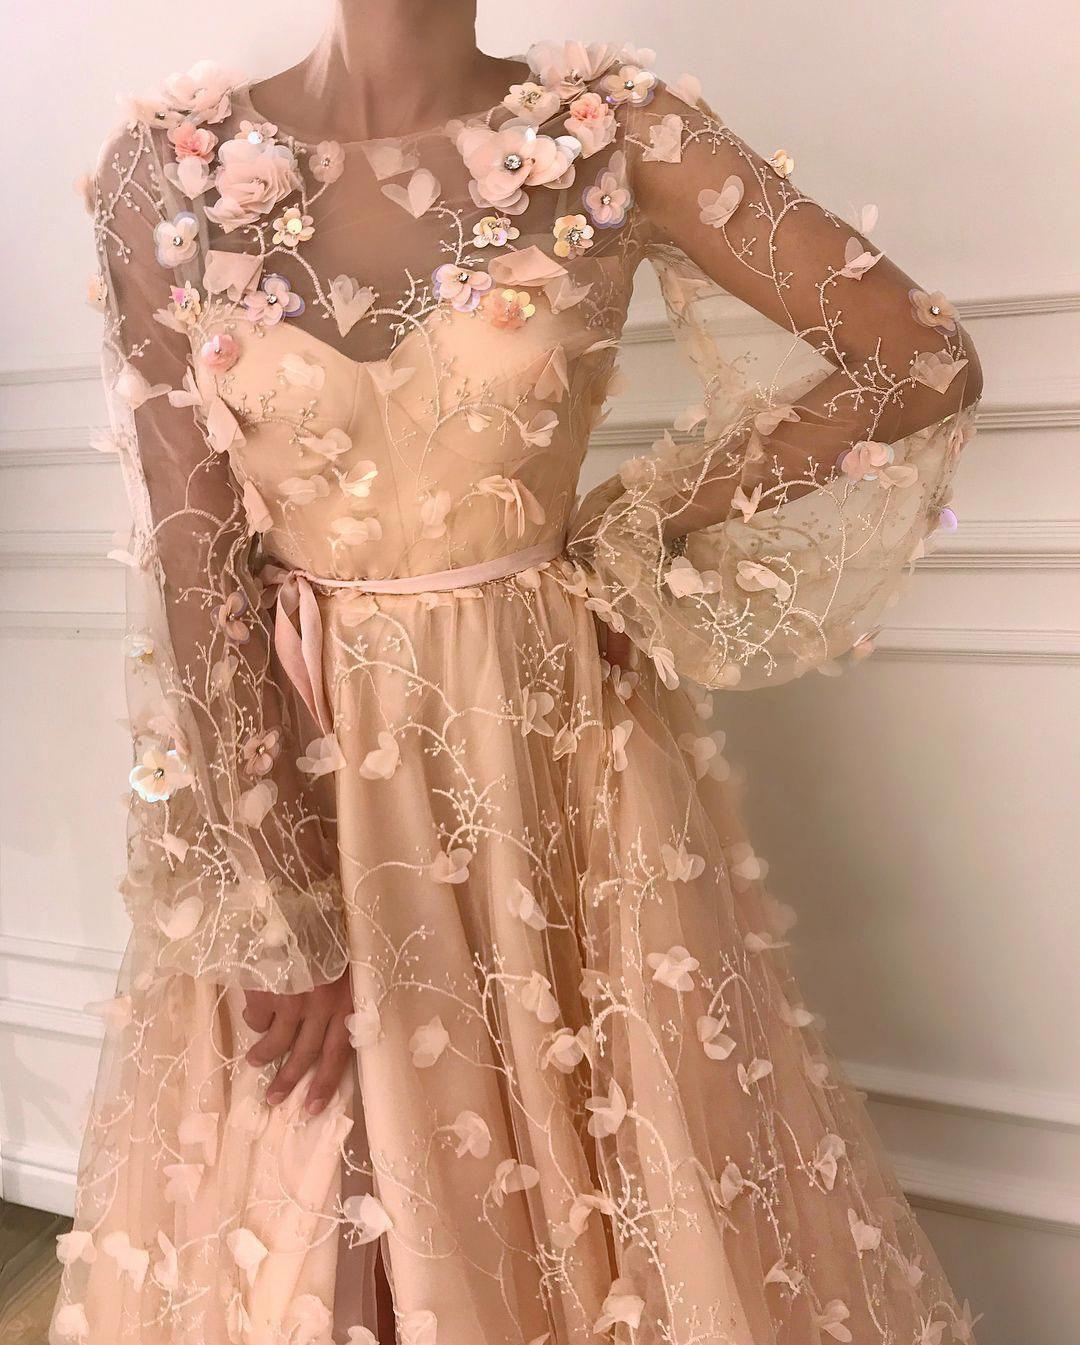 13 Perfekt Elegante Damen Kleider Wadenlang VertriebFormal Top Elegante Damen Kleider Wadenlang Galerie